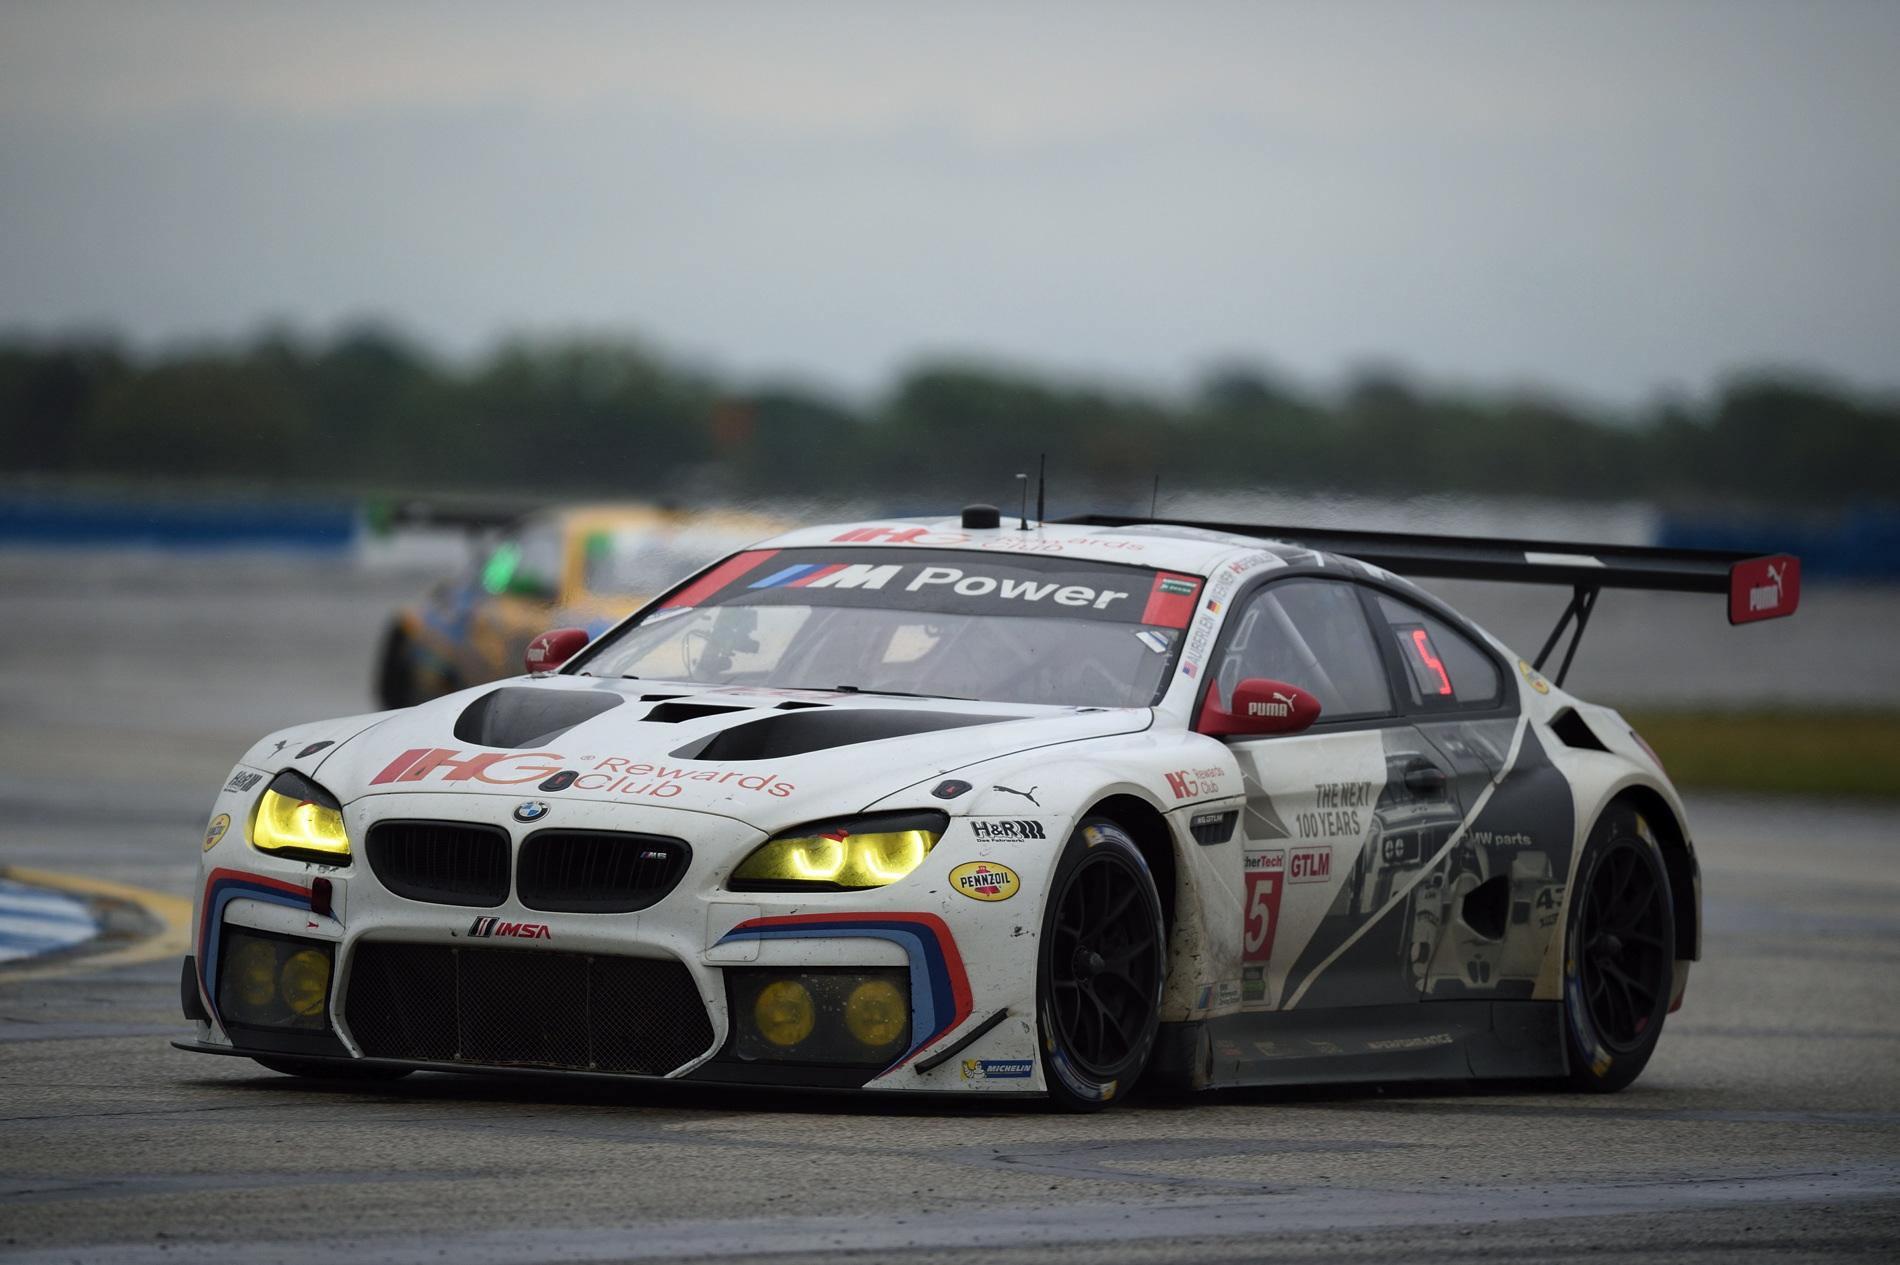 2016 Sebring BMW M6 GTLM results 42